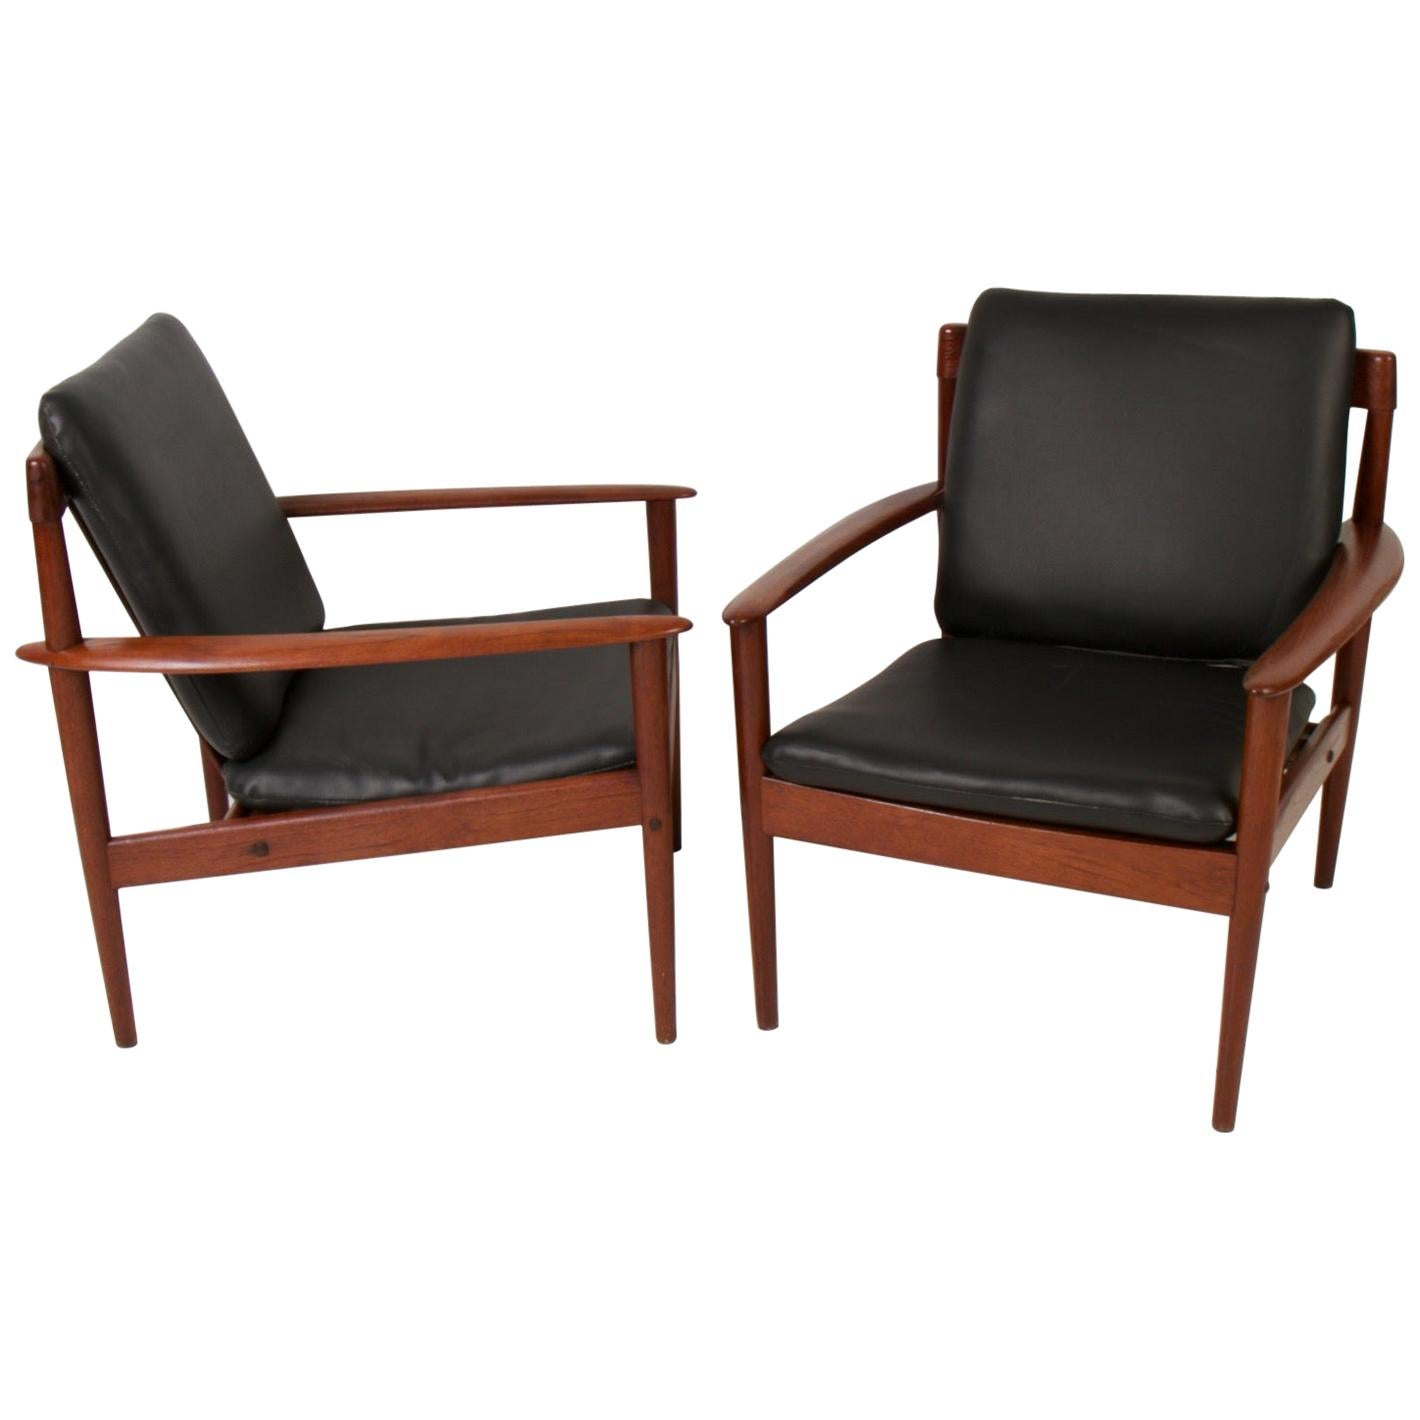 Pair of Danish Modern Teak Lounge Chairs by Grete Jalk